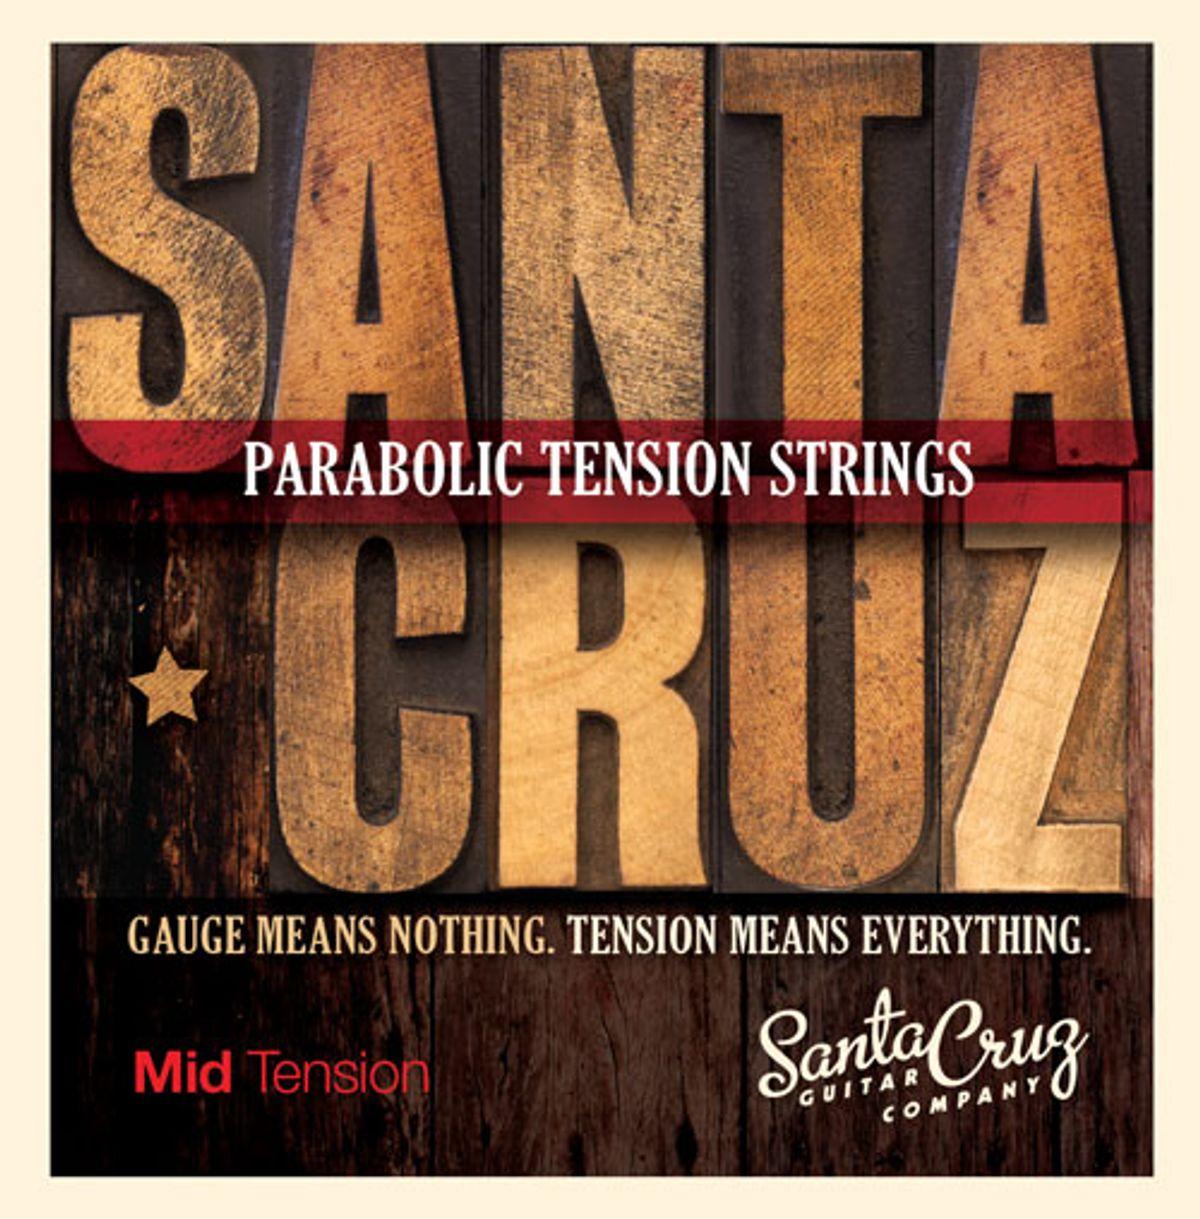 Santa Cruz Guitars Introduces Parabolic Tension Strings